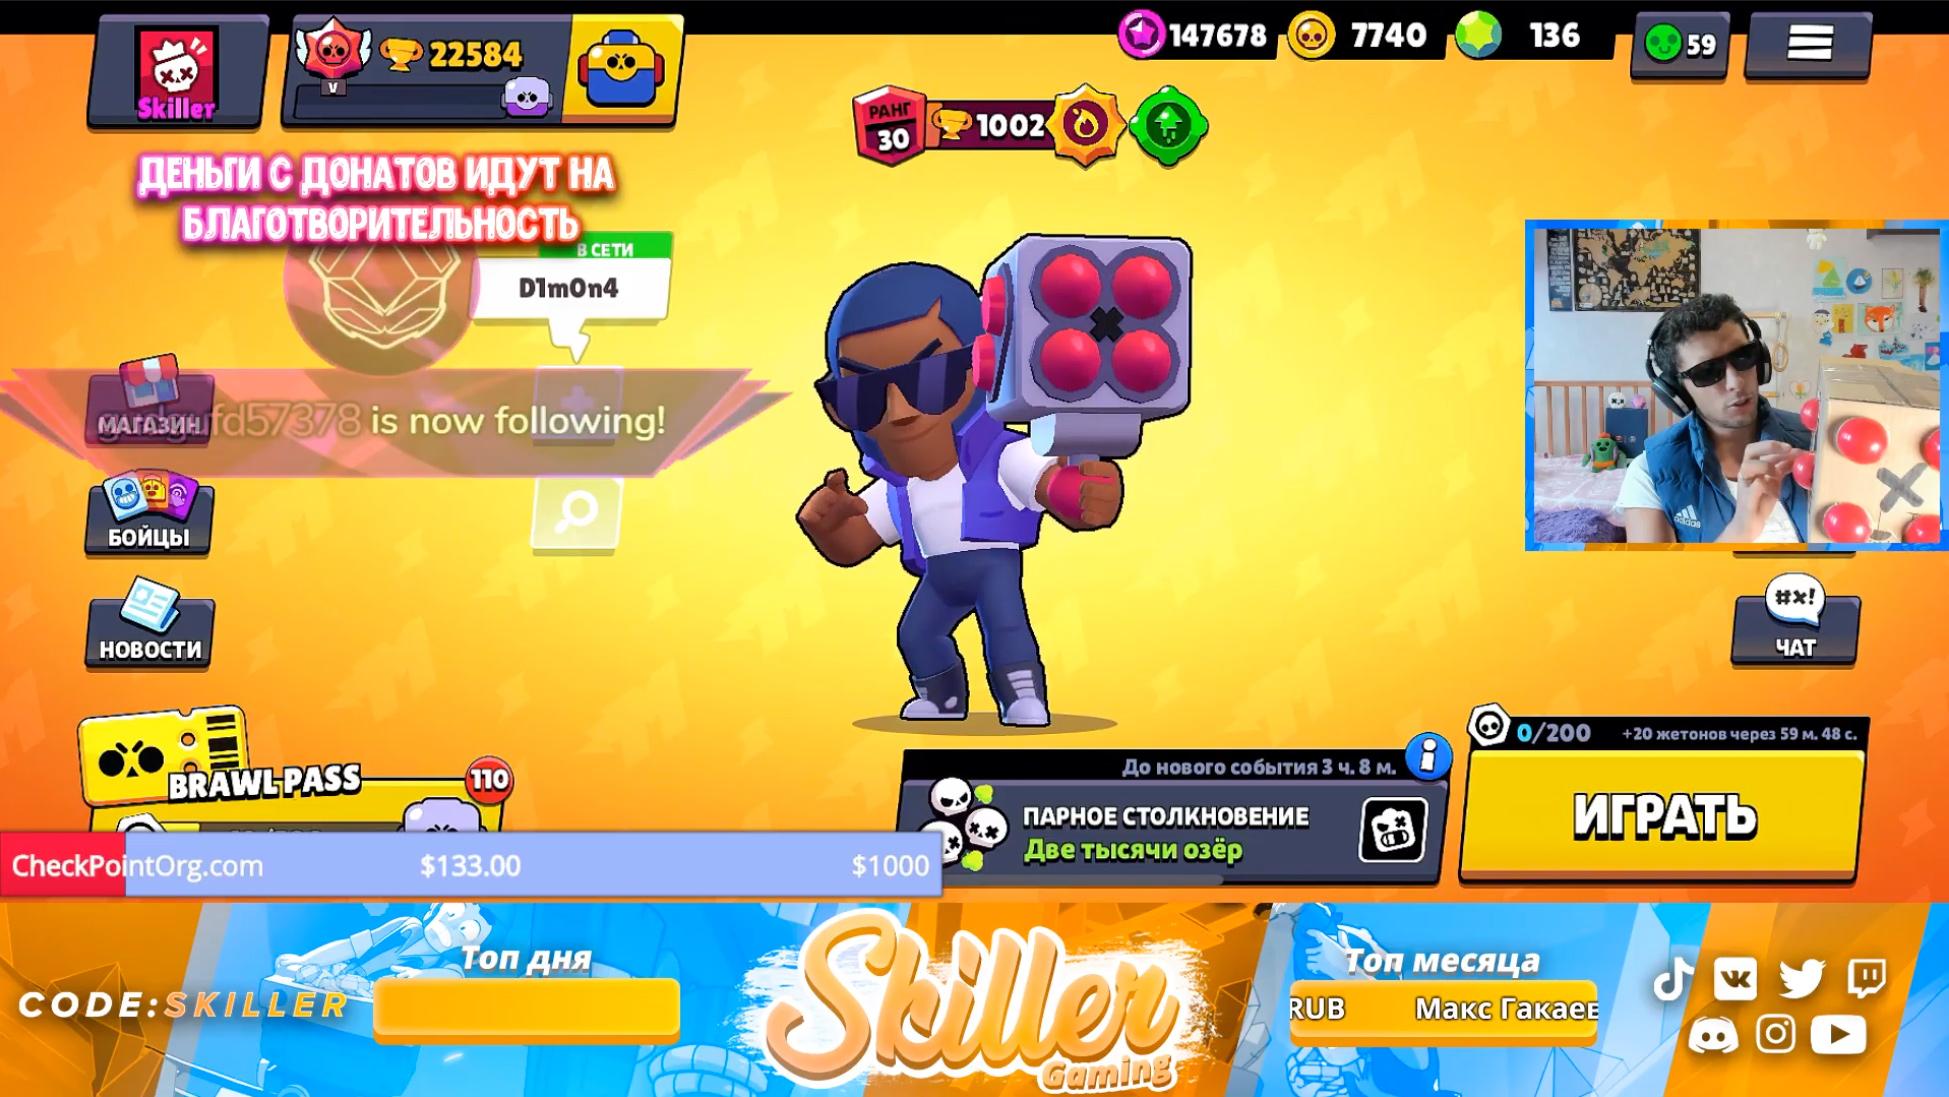 Skiller Gaming Cosplay as Brock